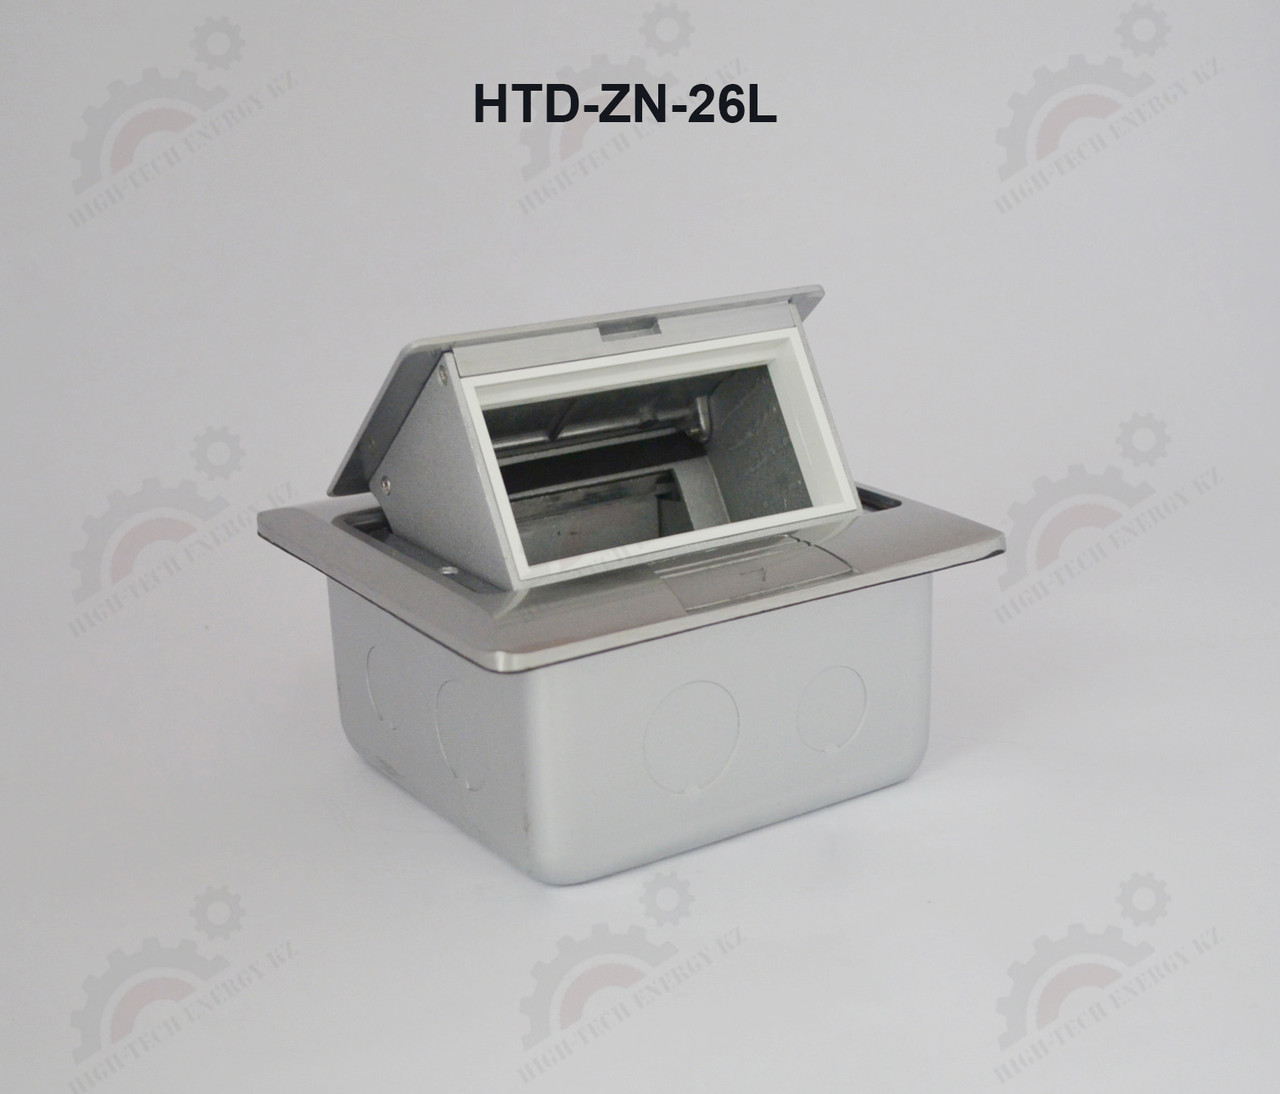 FEILIFU HTD-ZN-26L Напольный лючок на 4 модуля, металл, цвет серебро